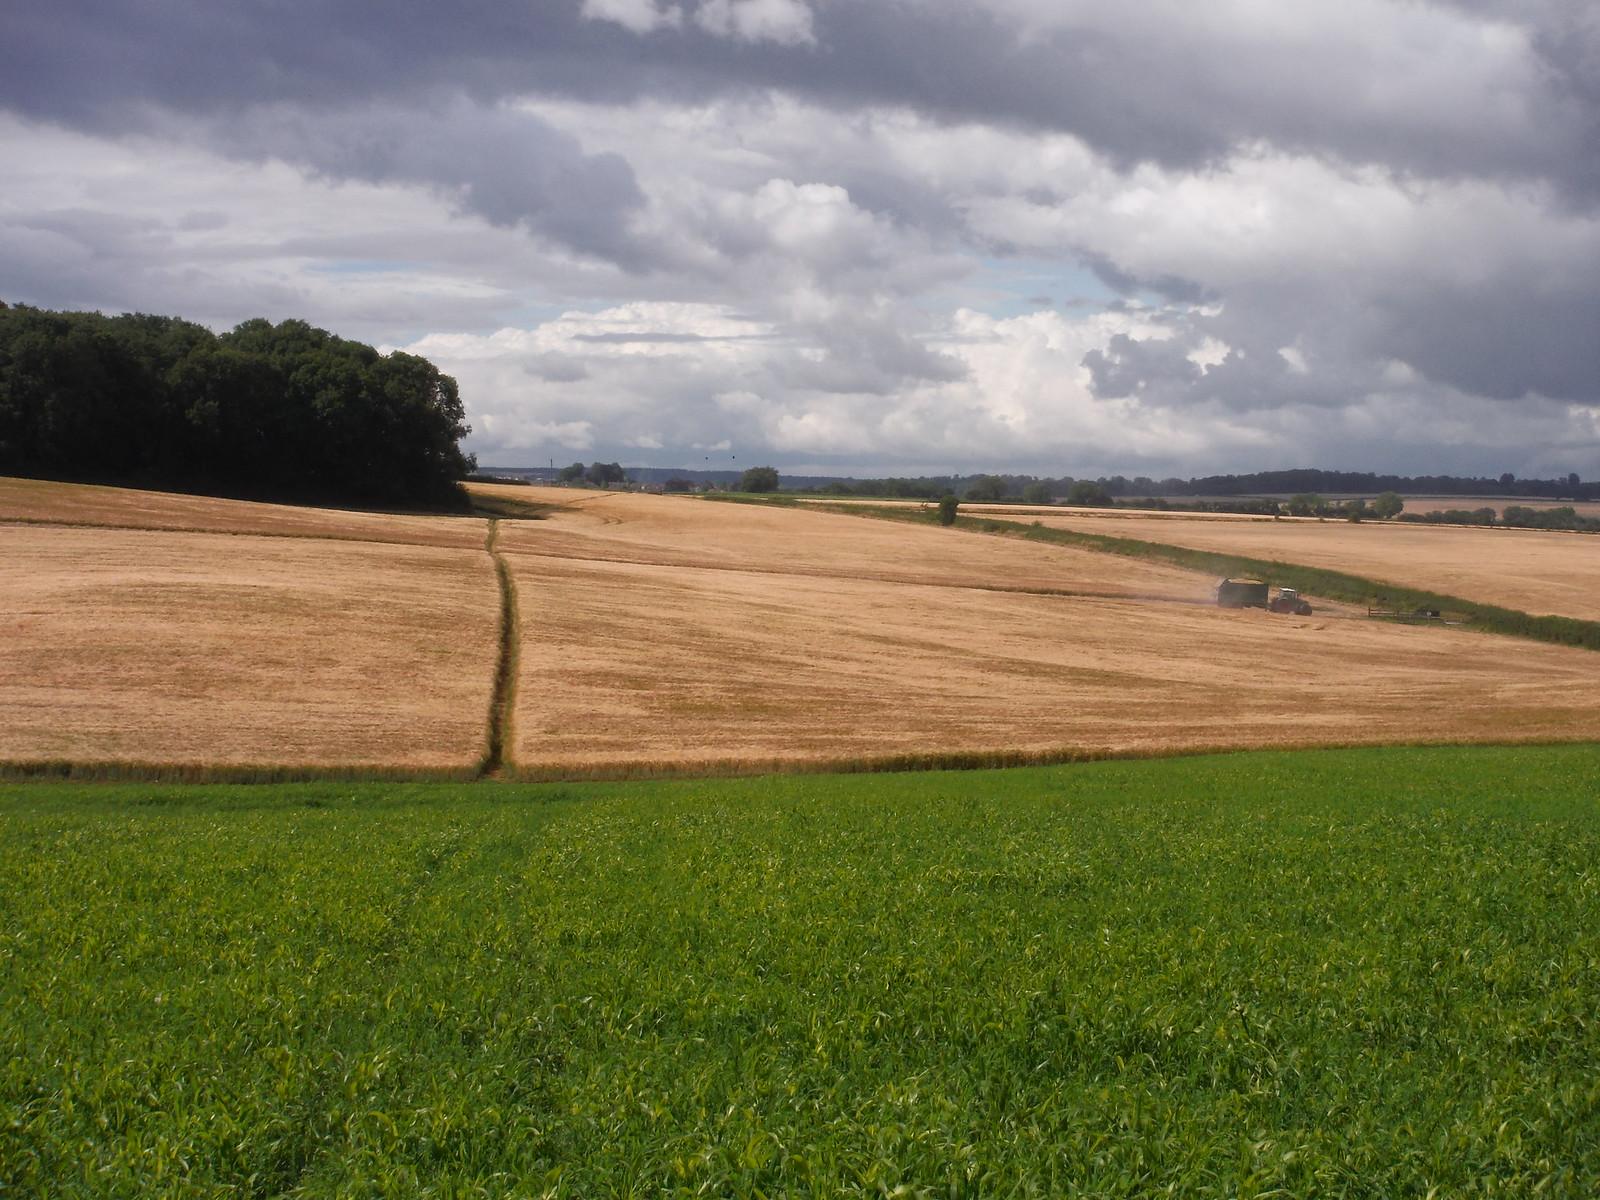 Through fields near Totterdale Farm SWC Walk 252 Tisbury Circular via Donhead St. Andrew